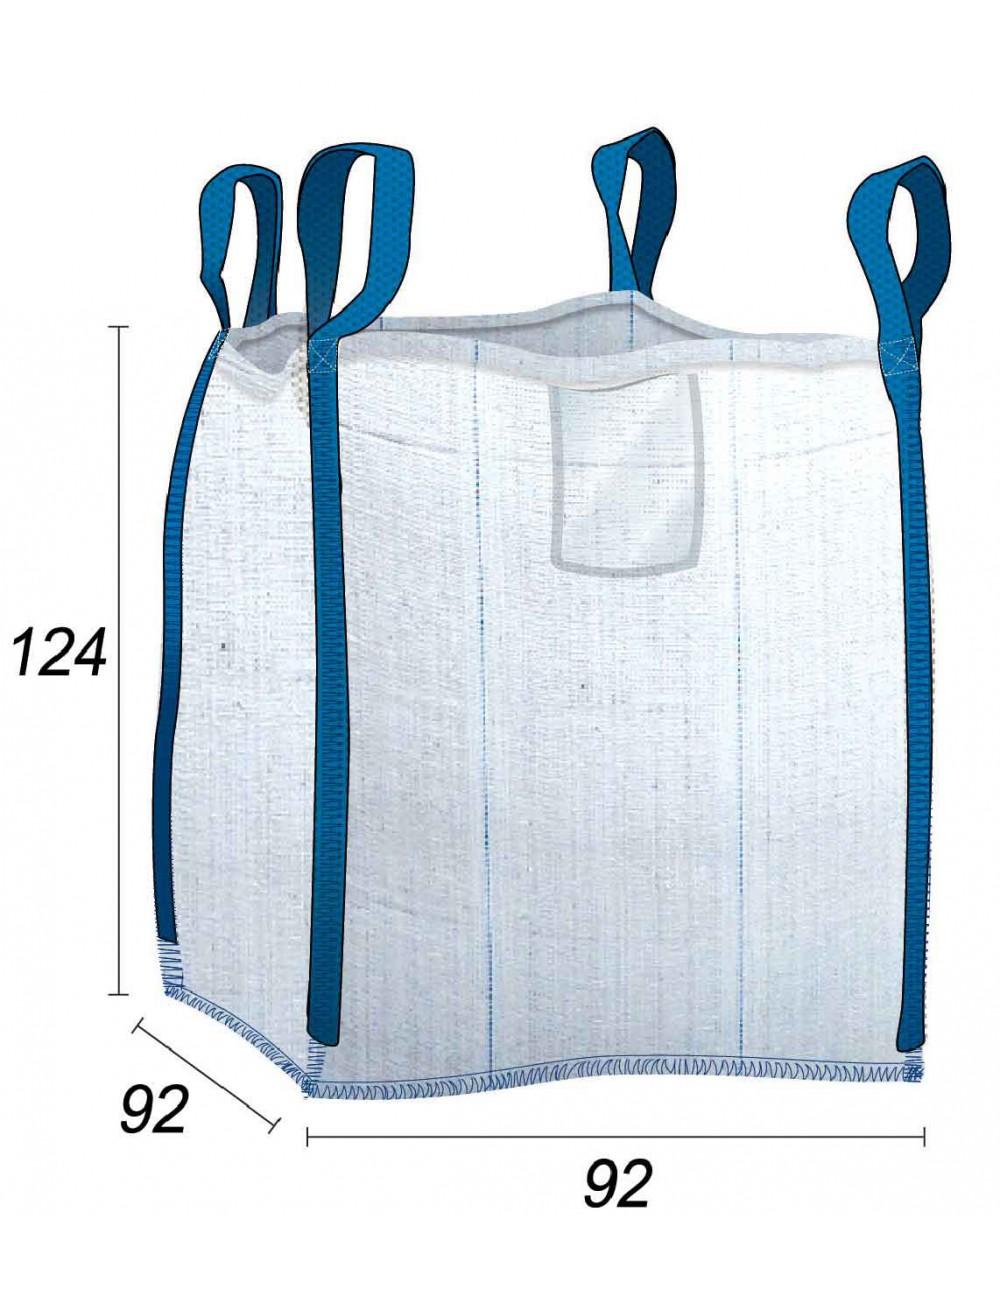 Big Bag 1,5 tonelada al mejor precio - 92X92X124